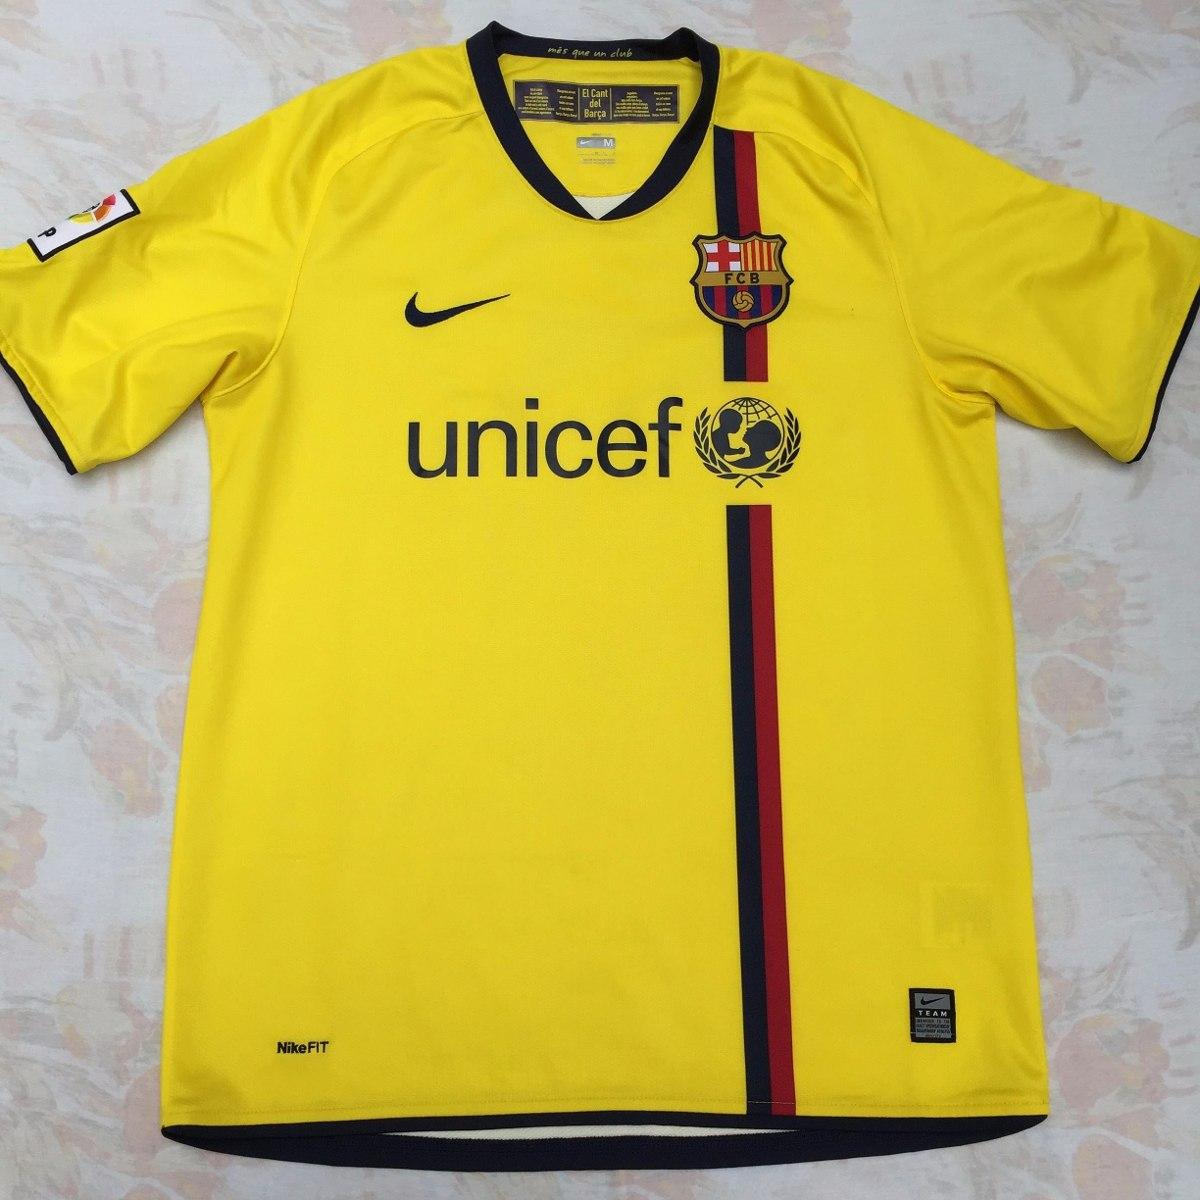 286787-760 Camisa Nike Barcelona Away 08 10 M Amarela Fn1608 - R ... 51ac7388ffad5